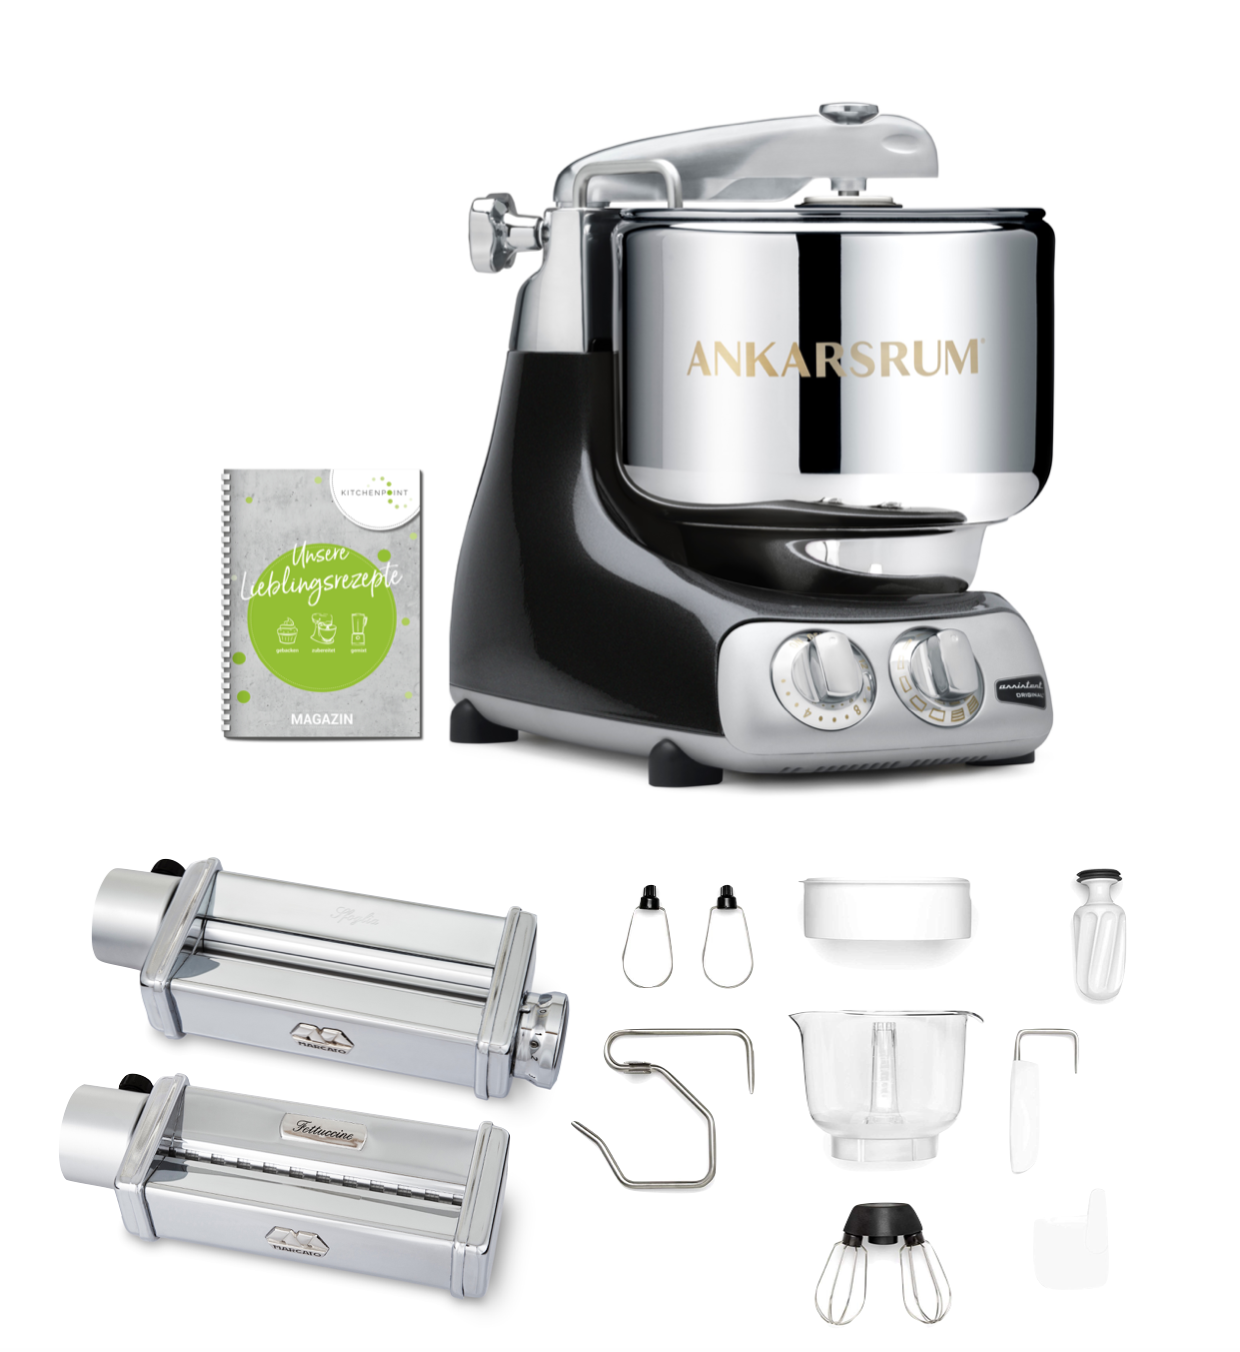 Ankarsrum Küchenmaschine Assistent Black Chrome - Pasta Set